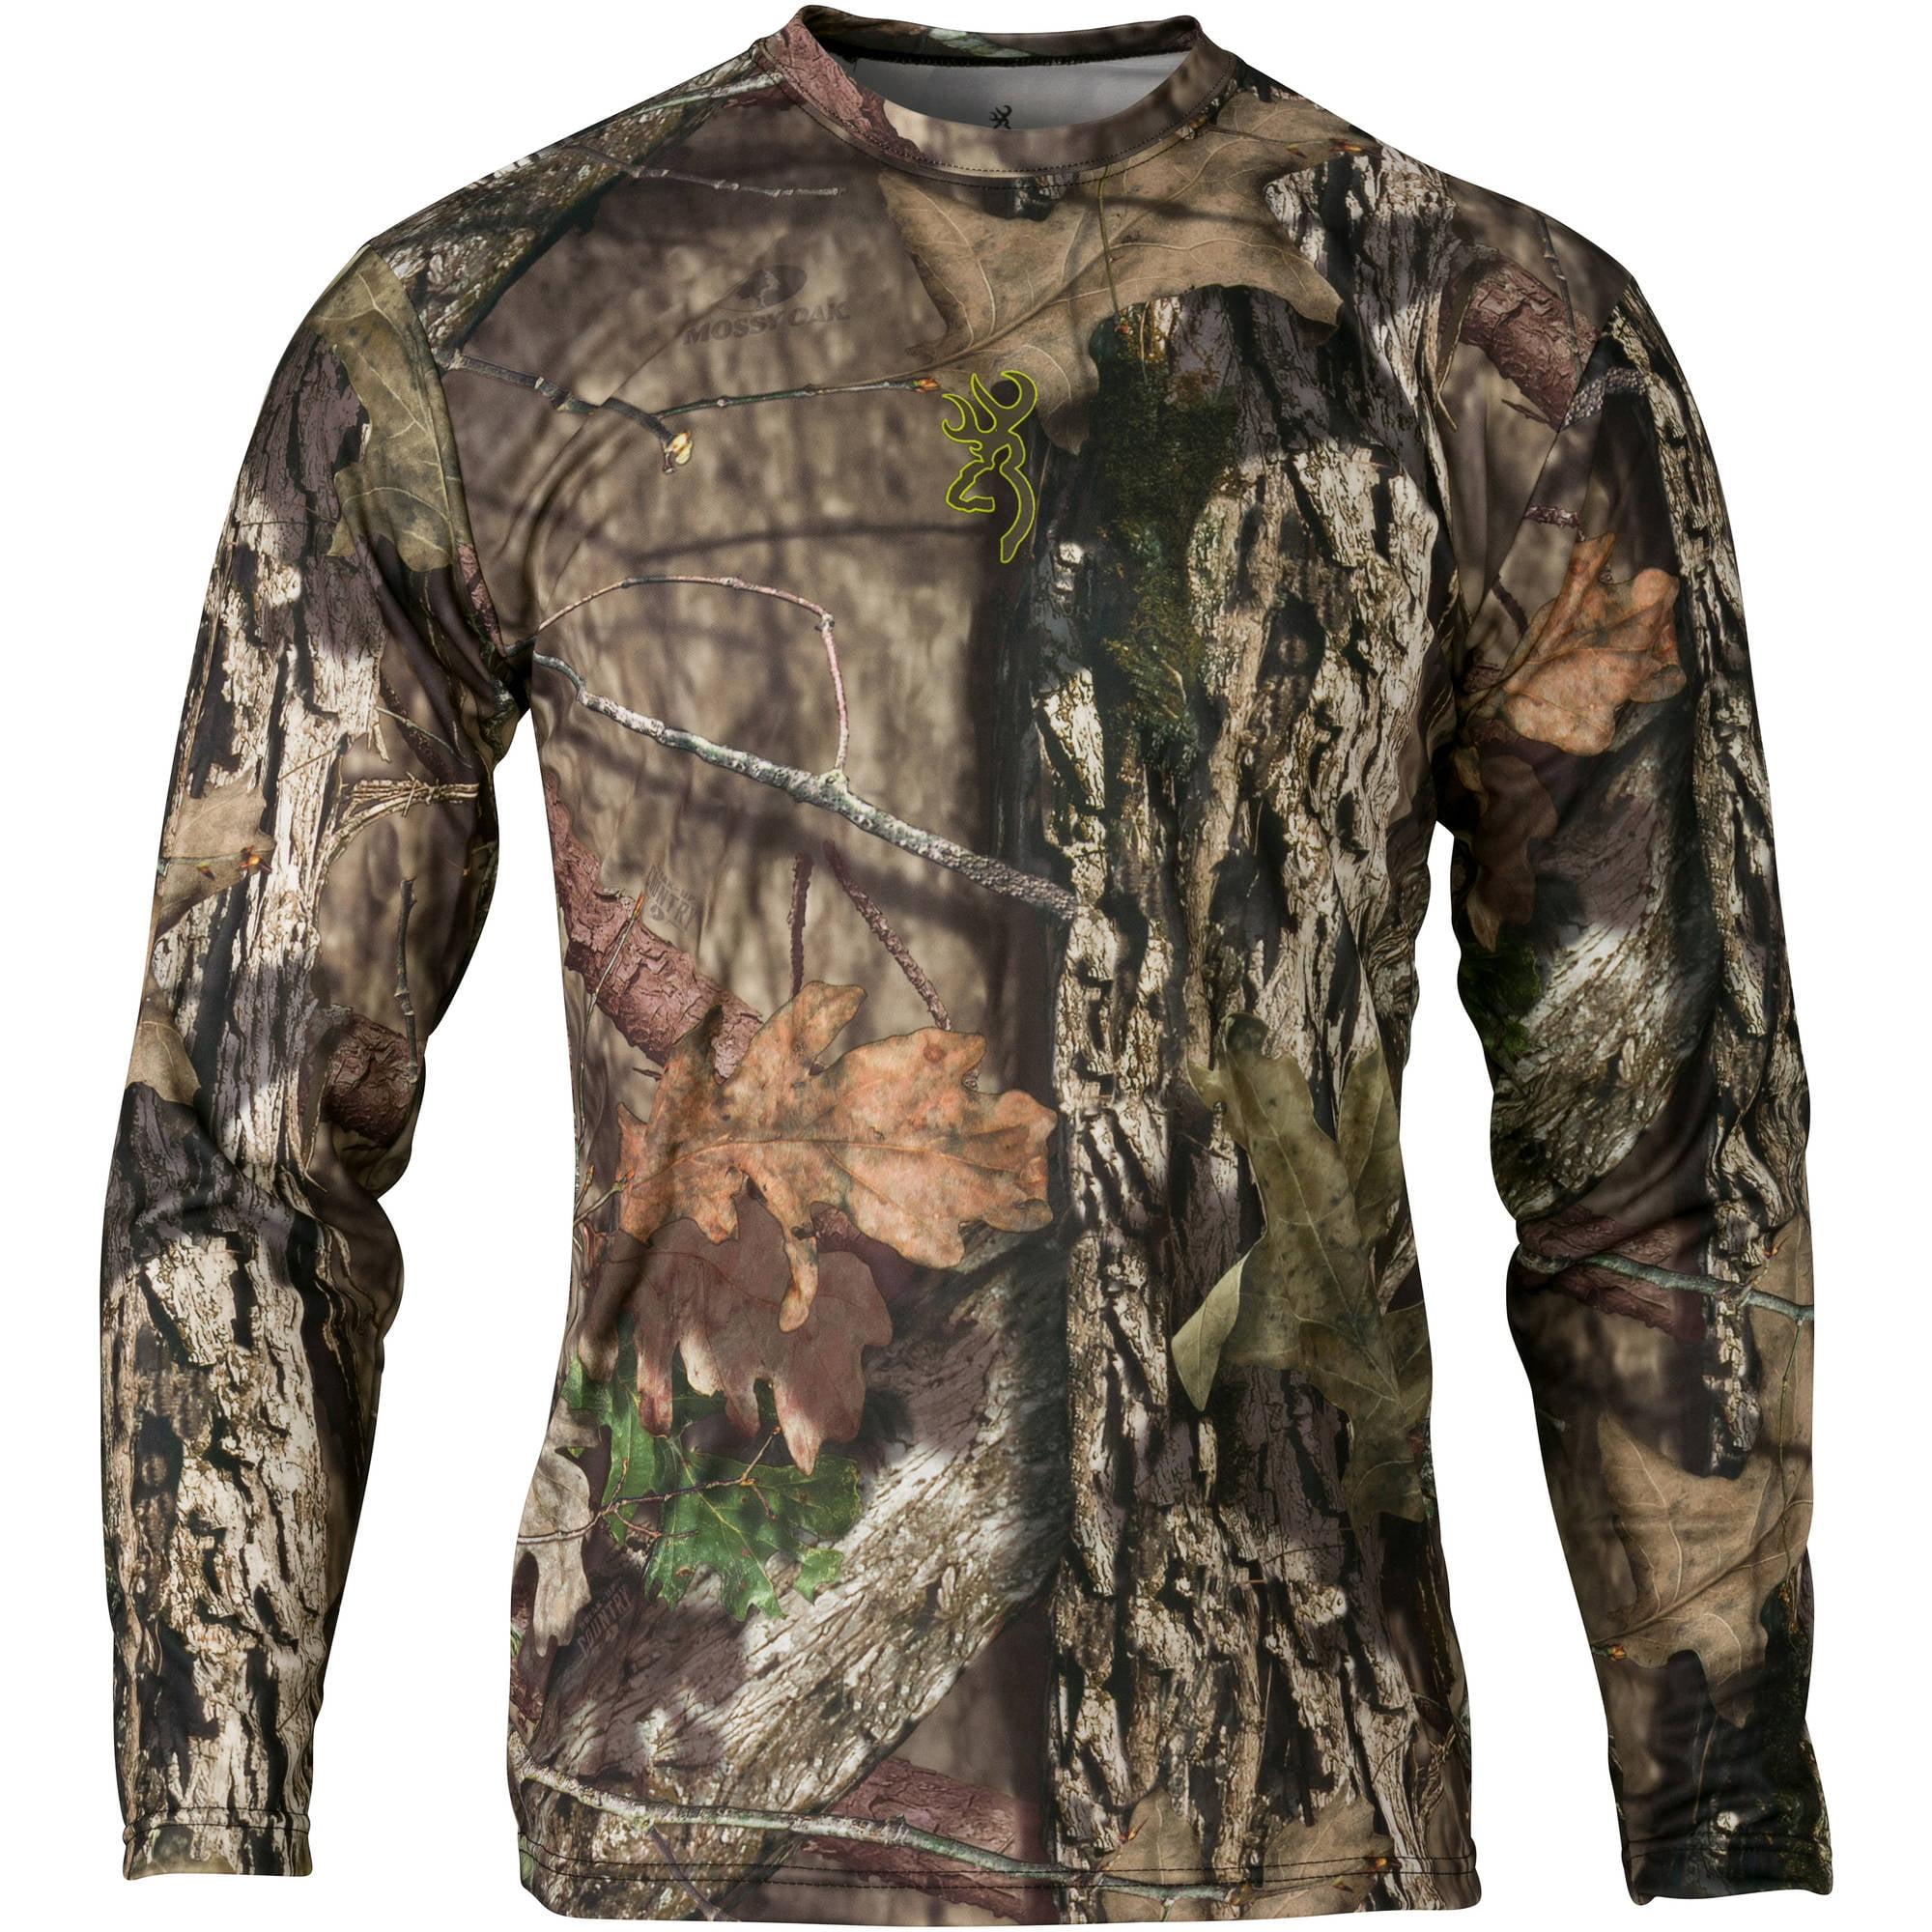 Browning Vapor Max Shirt, Long Sleeve Mossy Oak Break-Up Country